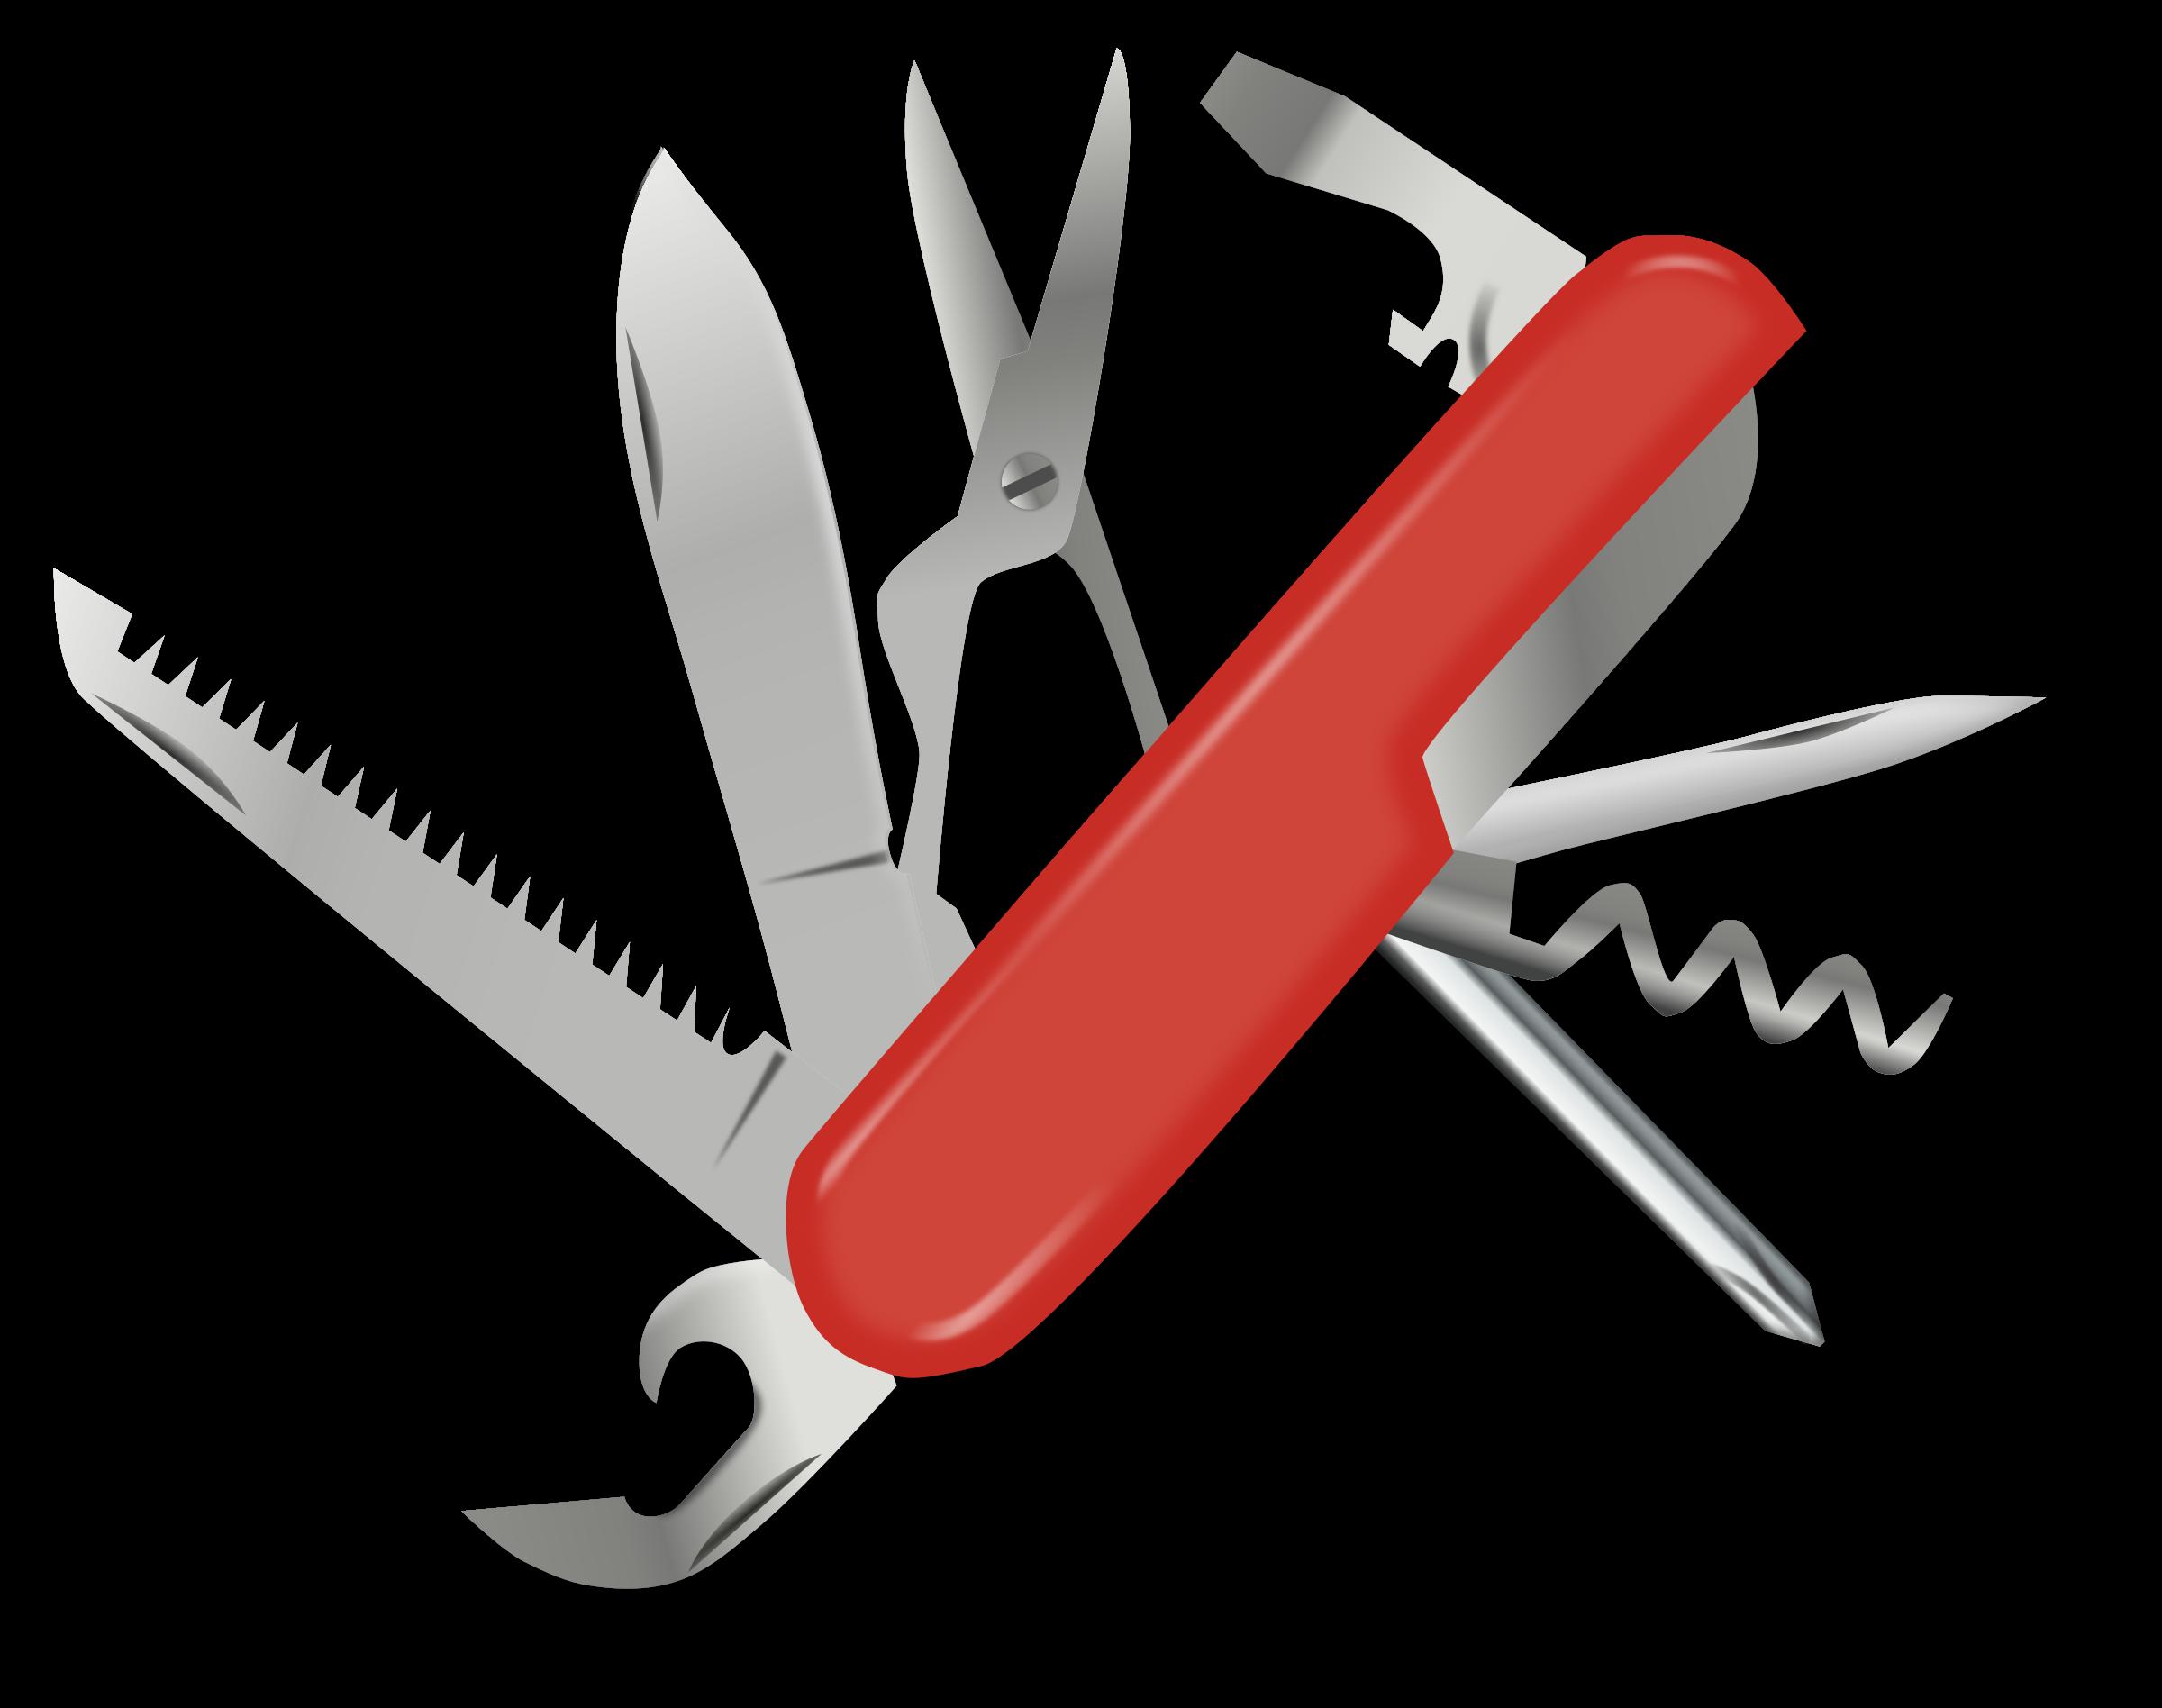 Swiss big image png. Knife clipart illustration